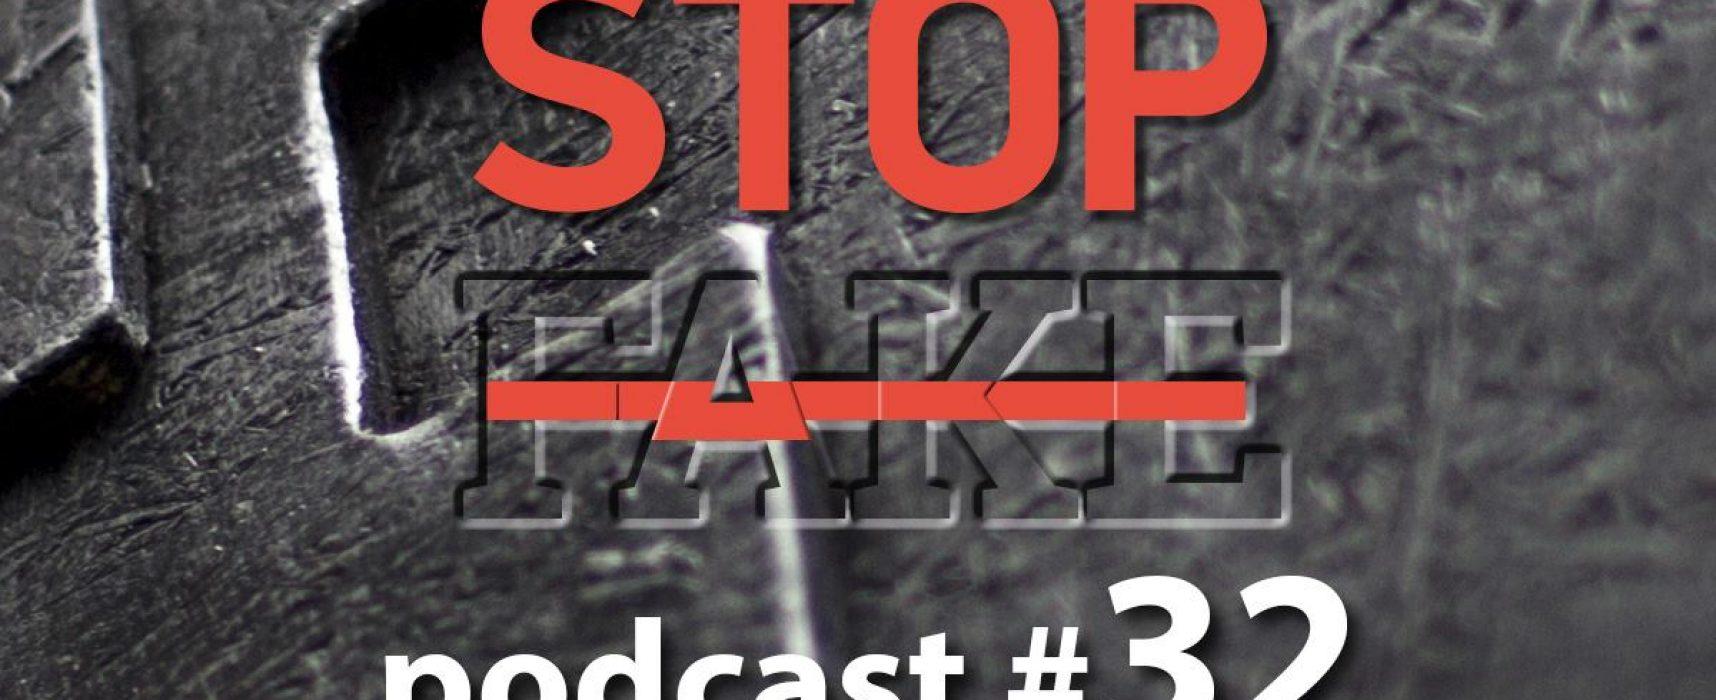 StopFake podcast #32